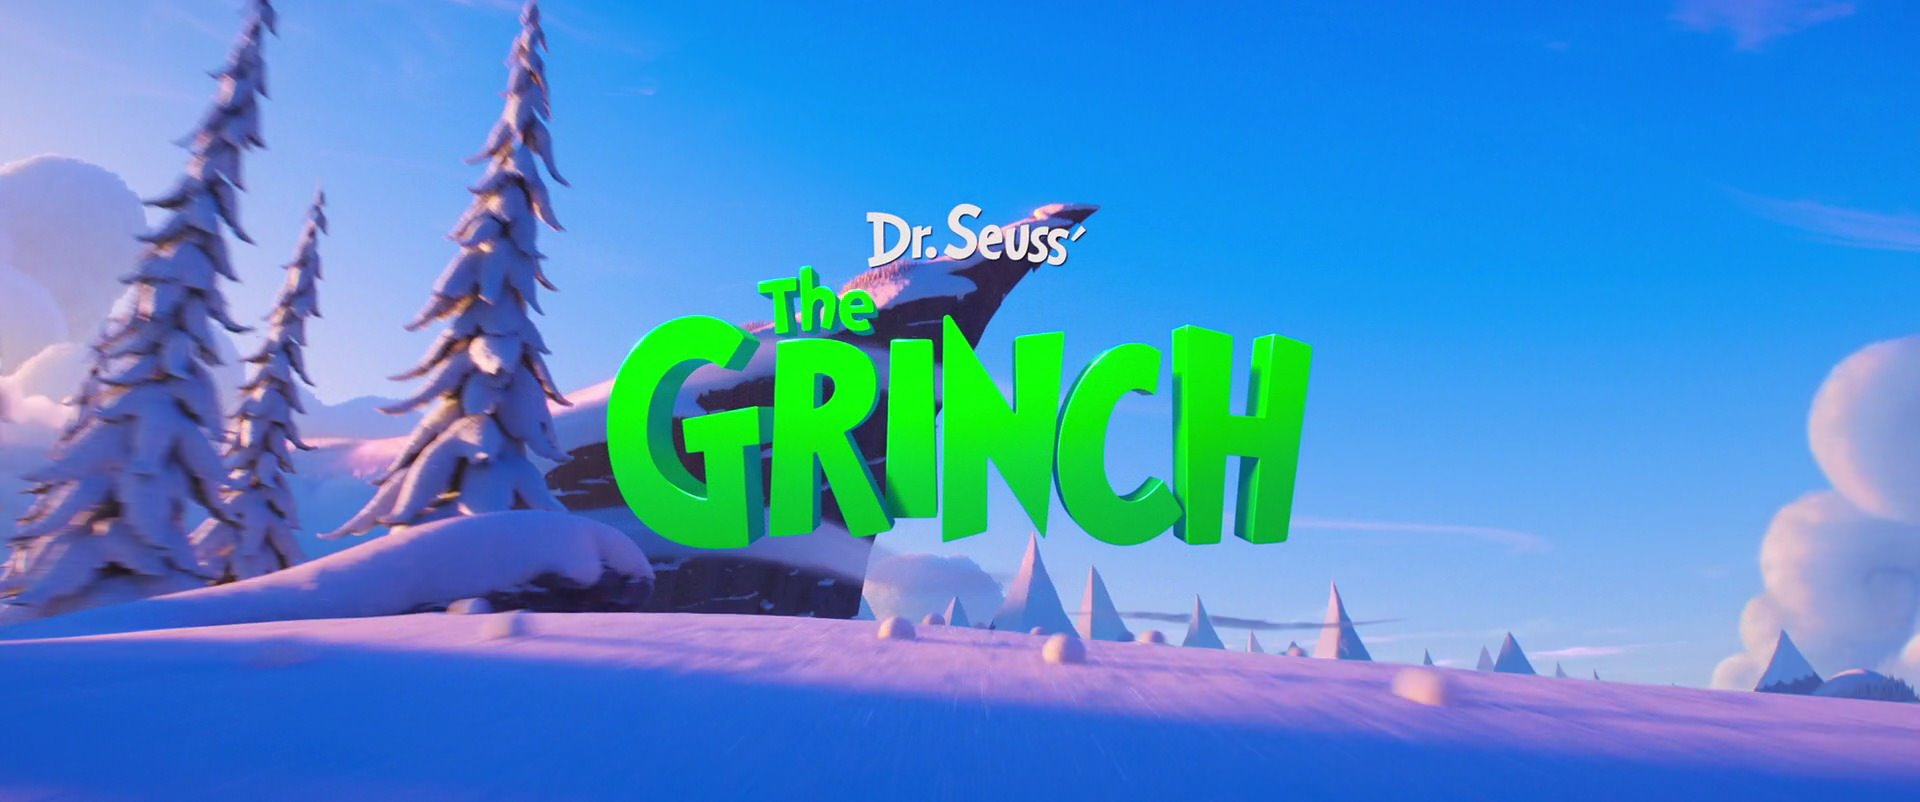 The Grinch 2018 Movie Christmas Specials Wiki Fandom